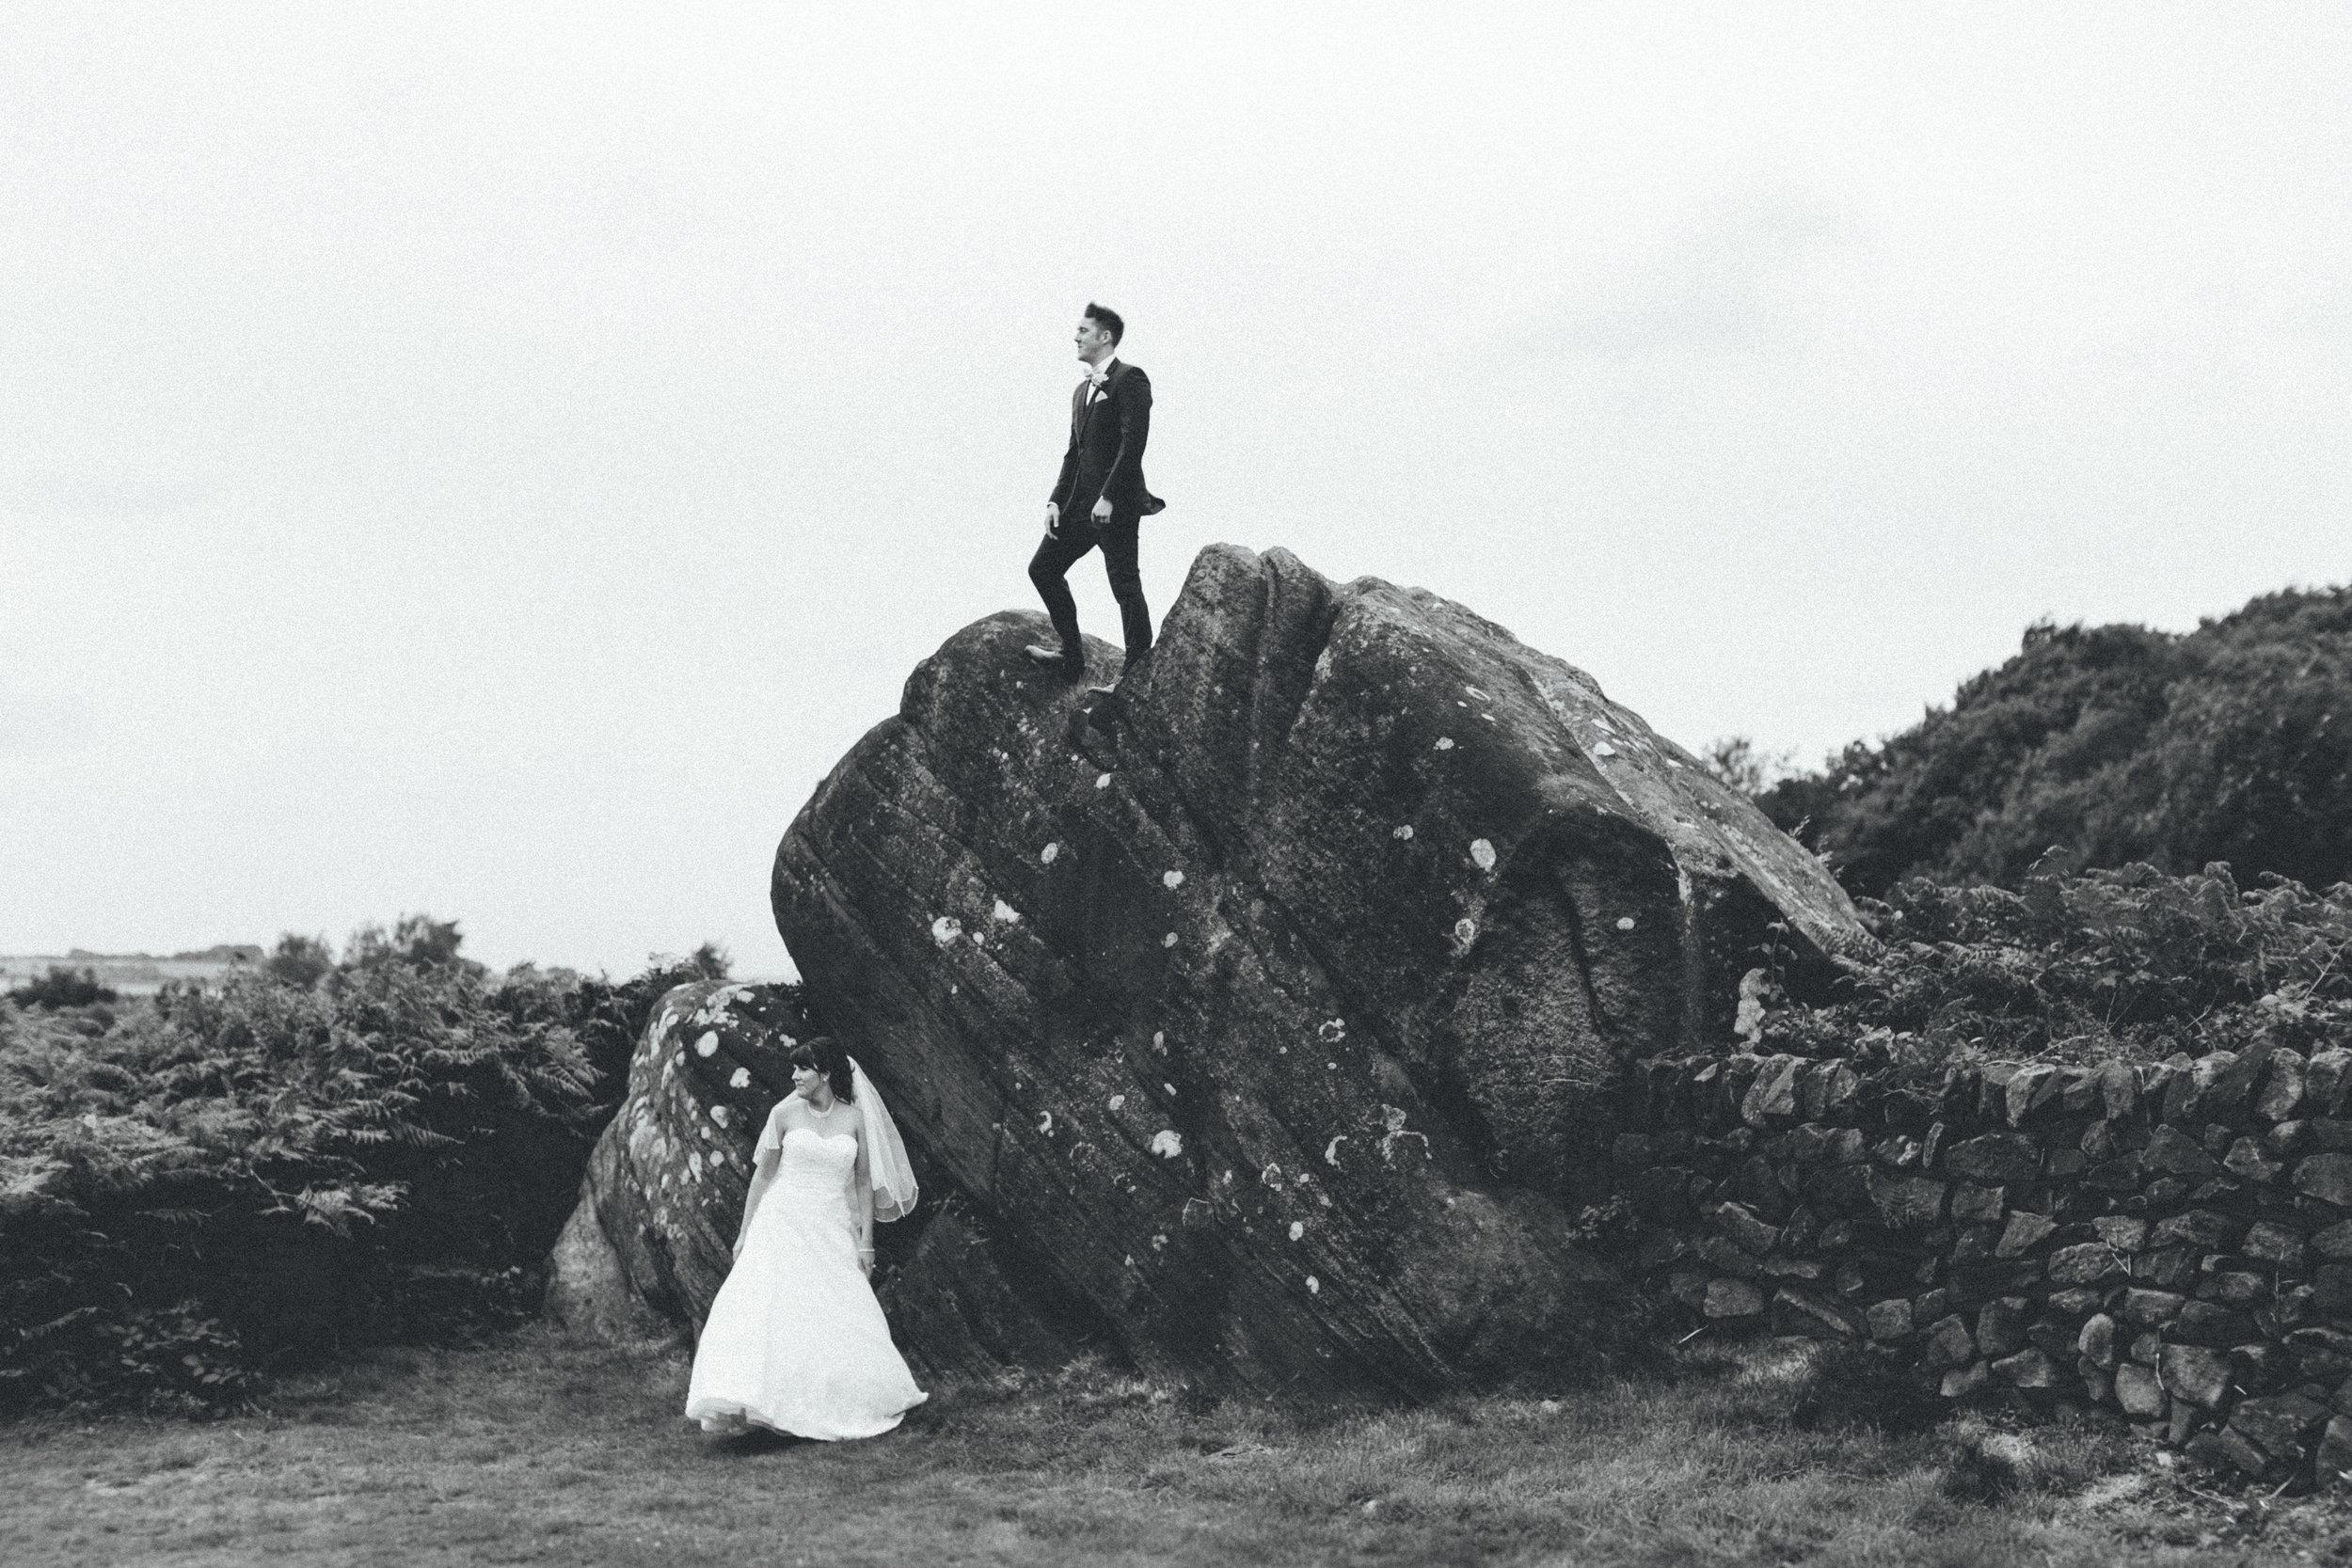 peak edge hotel wedding photography.jpg